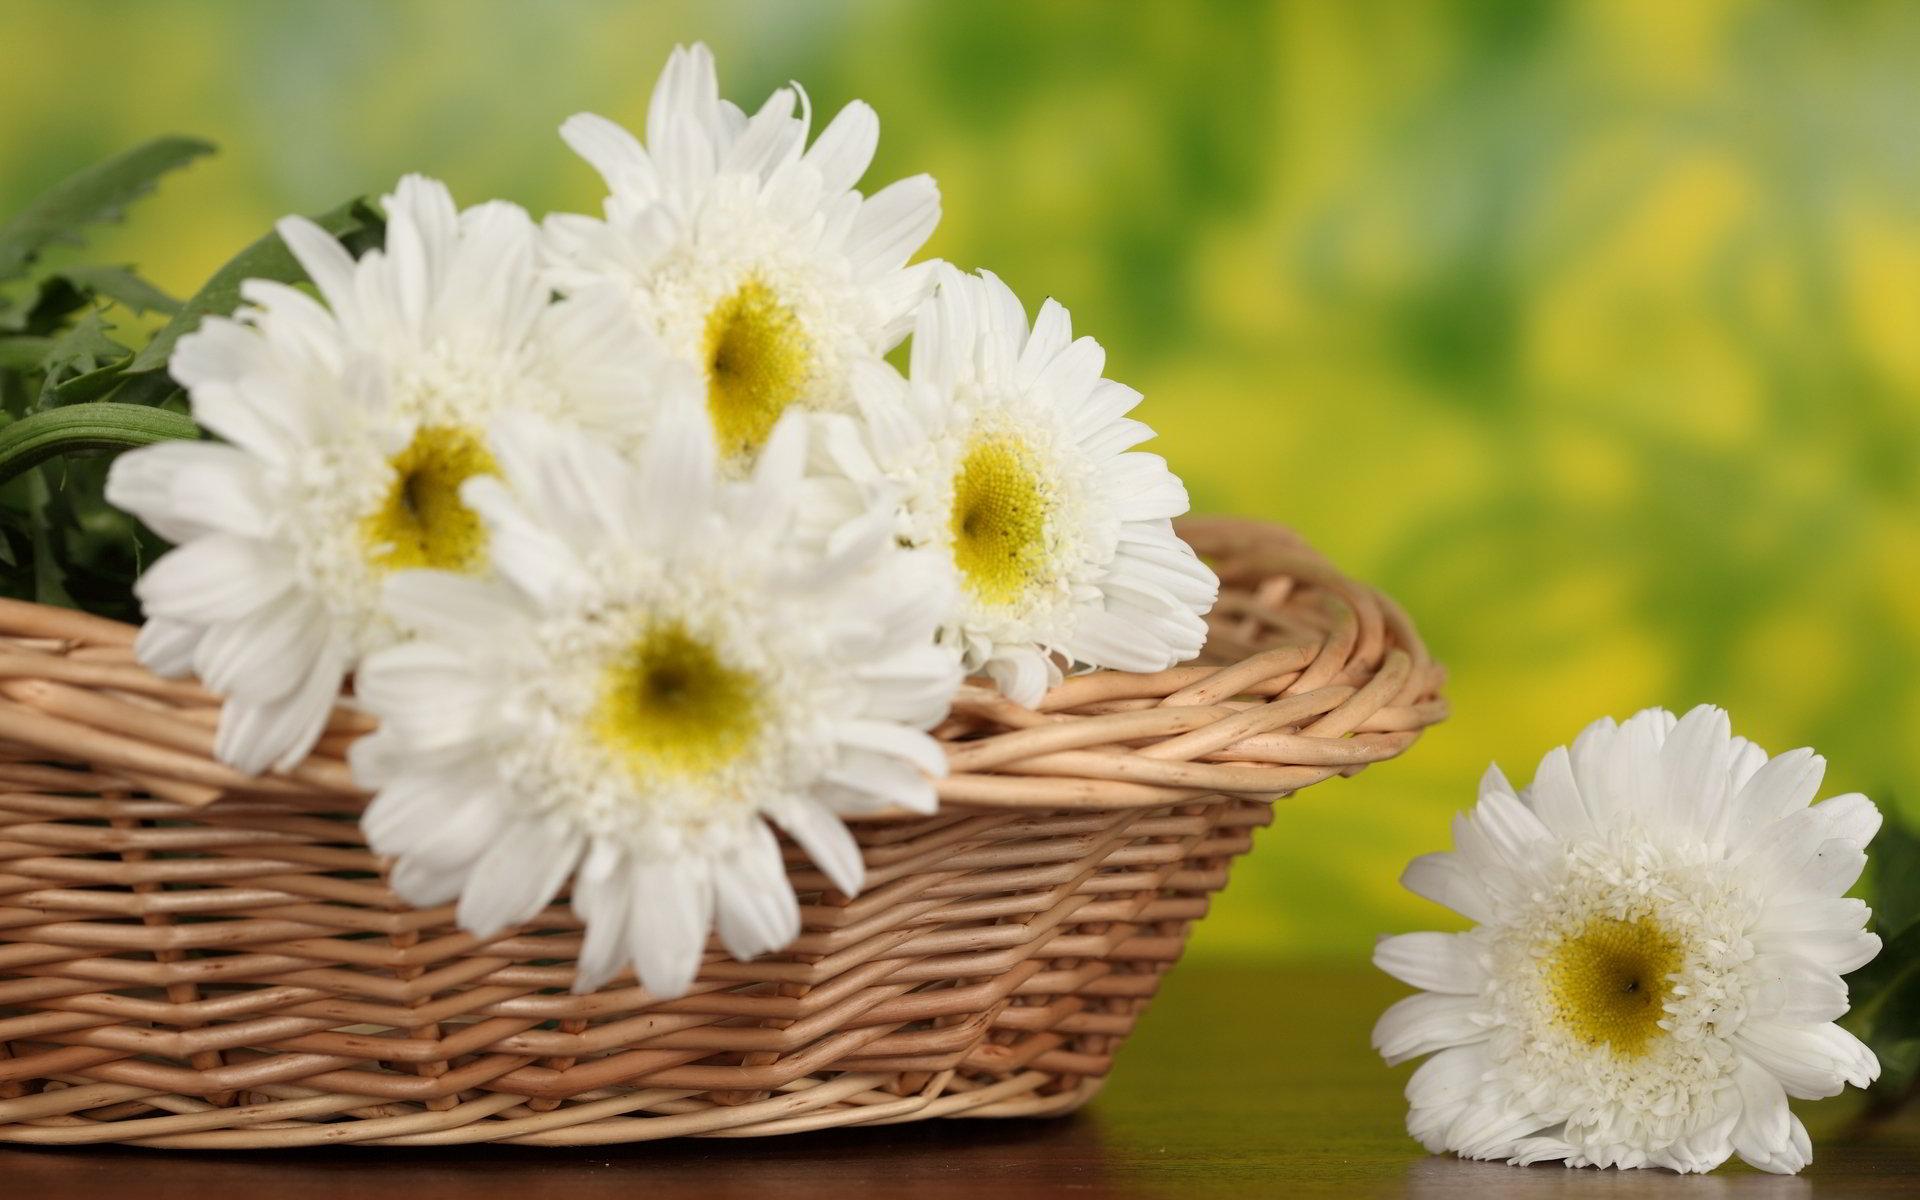 hinh anh hoa cuc dep 30